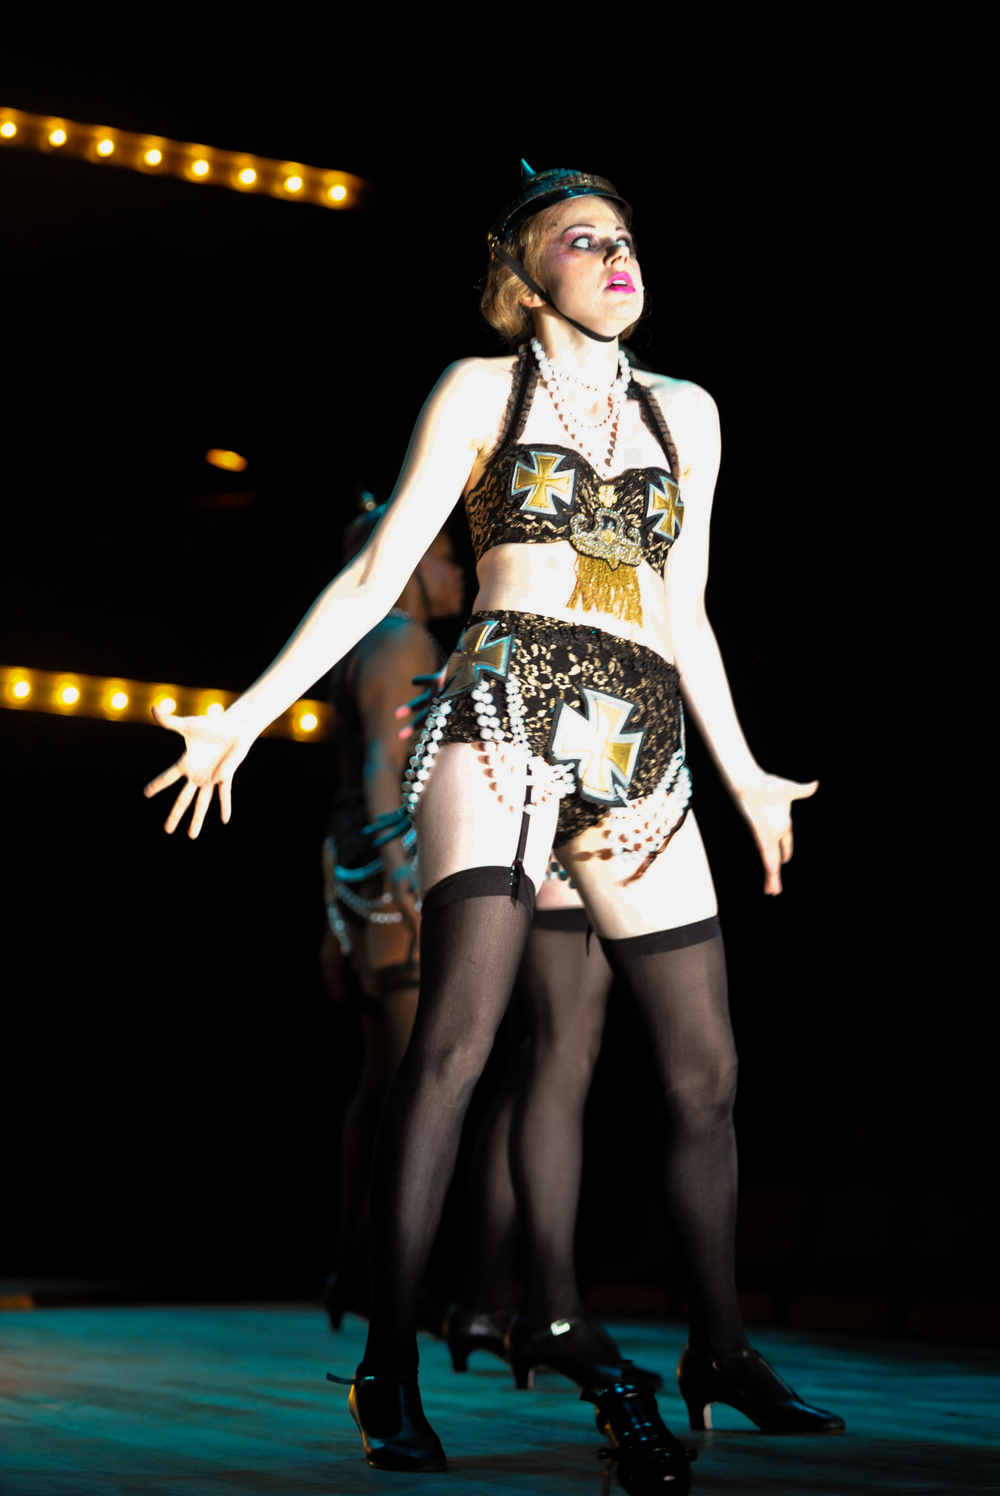 Rosie in  Cabaret  -  PlayMakers Rep  2013 - Photos by Jon Gardiner